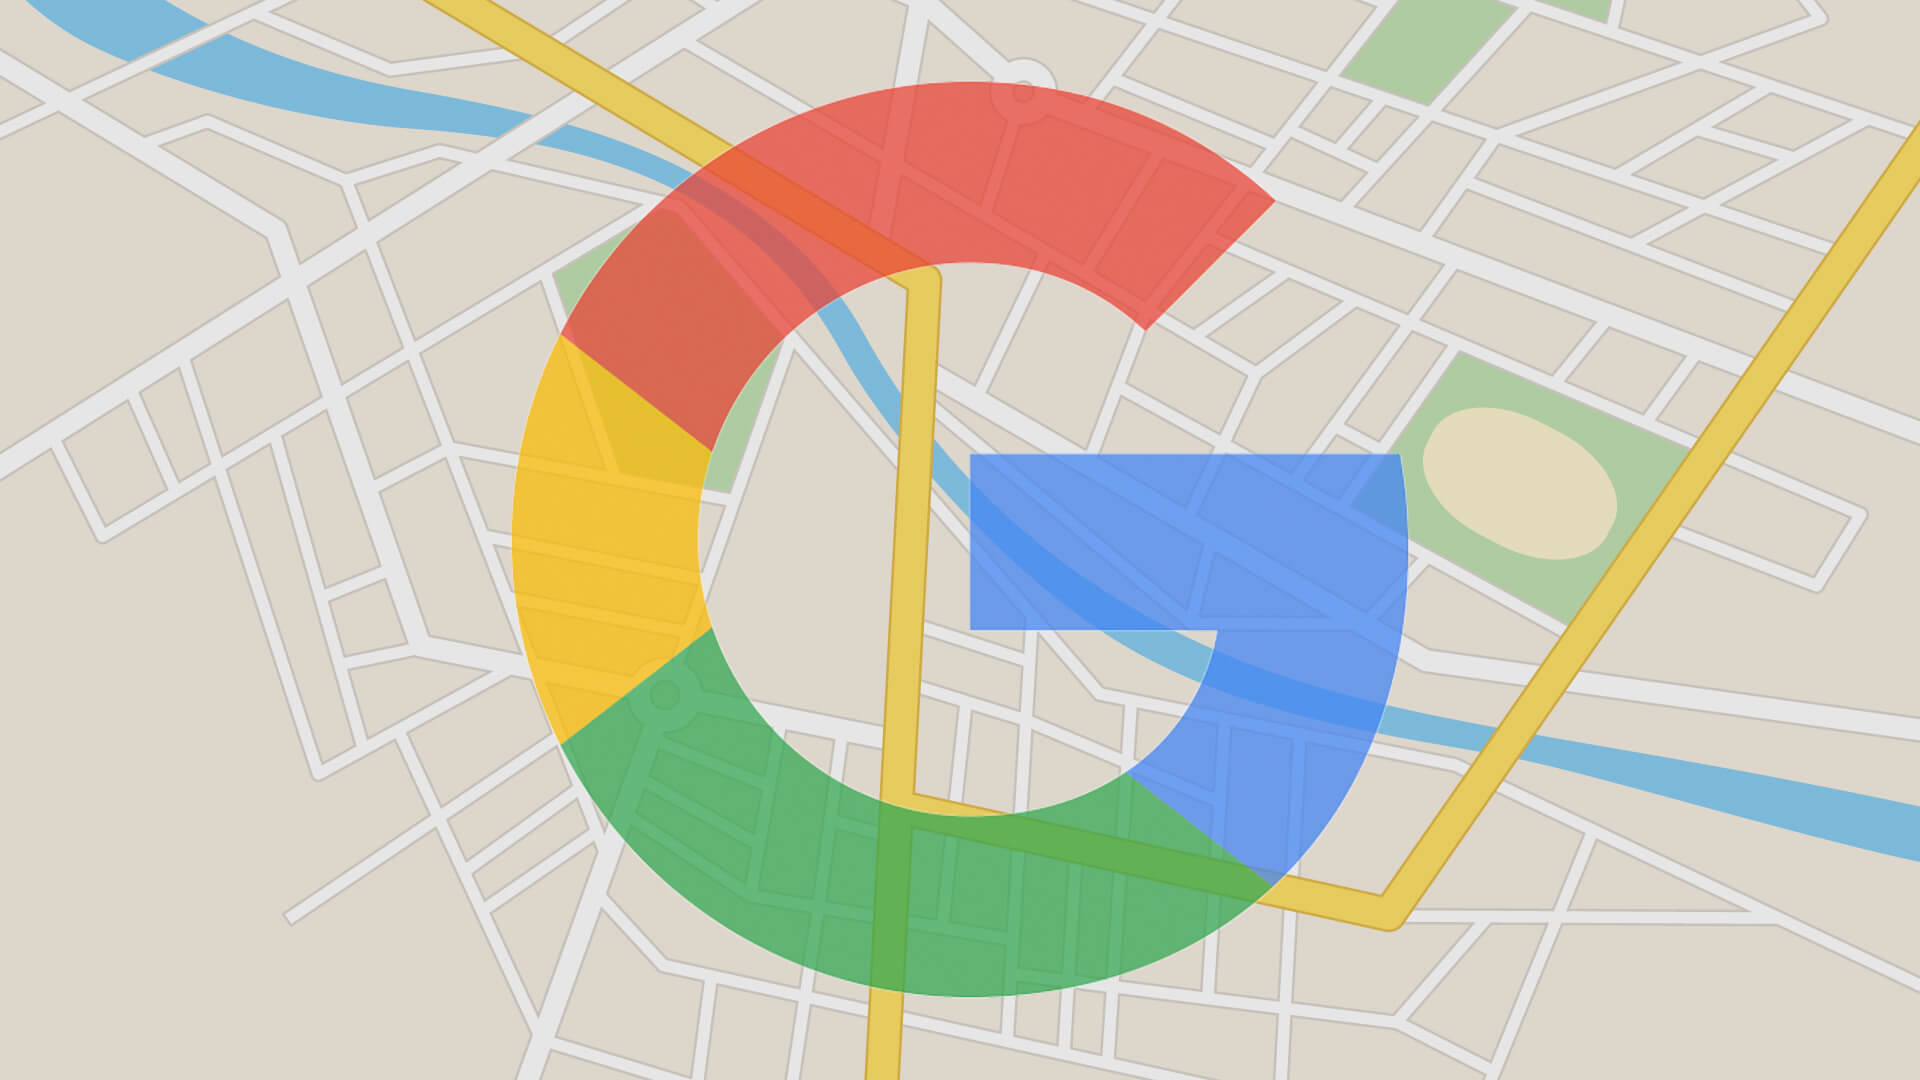 Dịch vụ xác minh Google Maps   SEO Google Maps » iAgency Solution